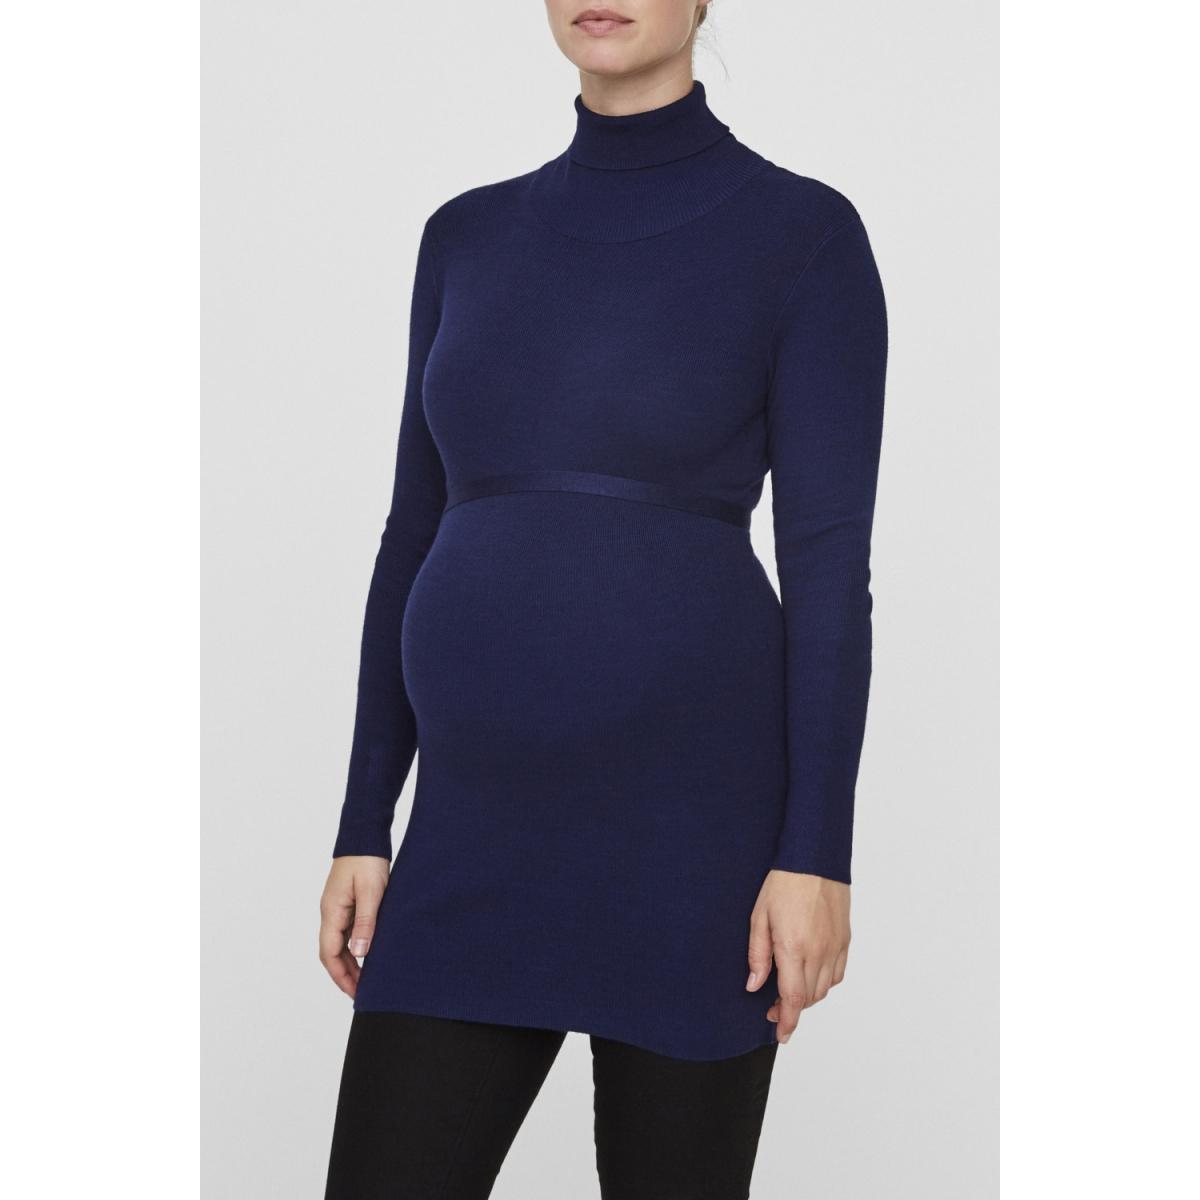 mljacina l/s knit rollneck 20004688 mama-licious positie trui medieval blue